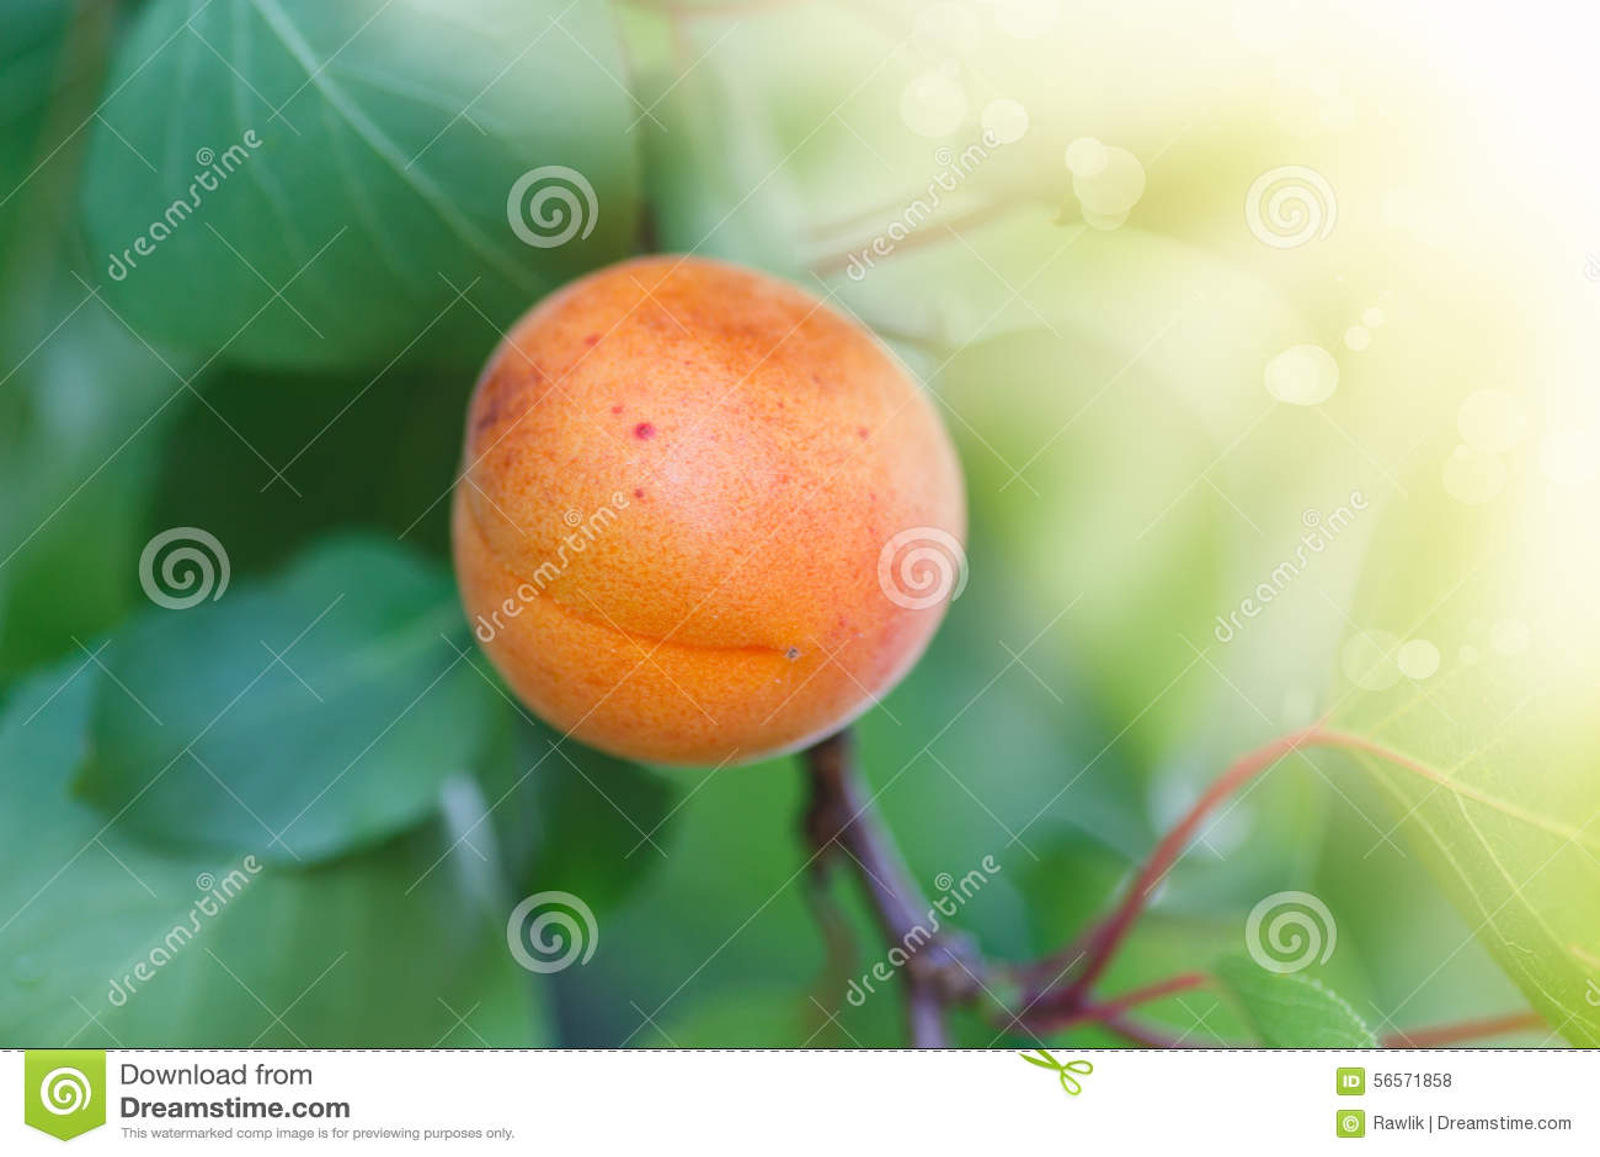 Download Δέντρο βερικοκιών με την ανάπτυξη φρούτων Στοκ Εικόνες - εικόνα από ανάπτυξη, growing: 56571858